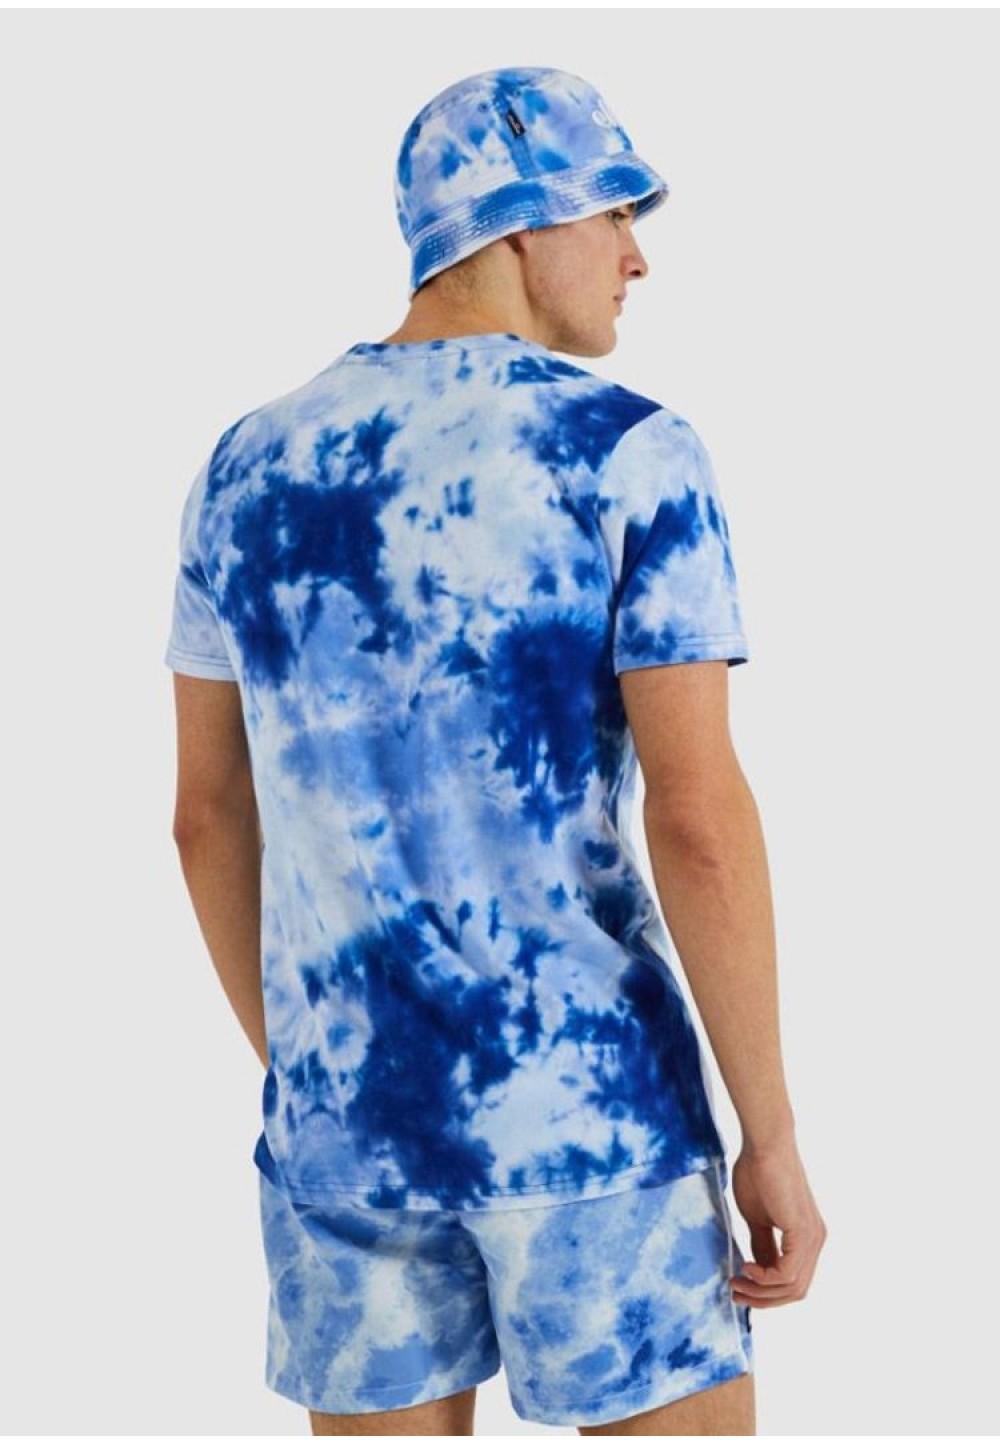 Голубая футболка Prado Tie Dye